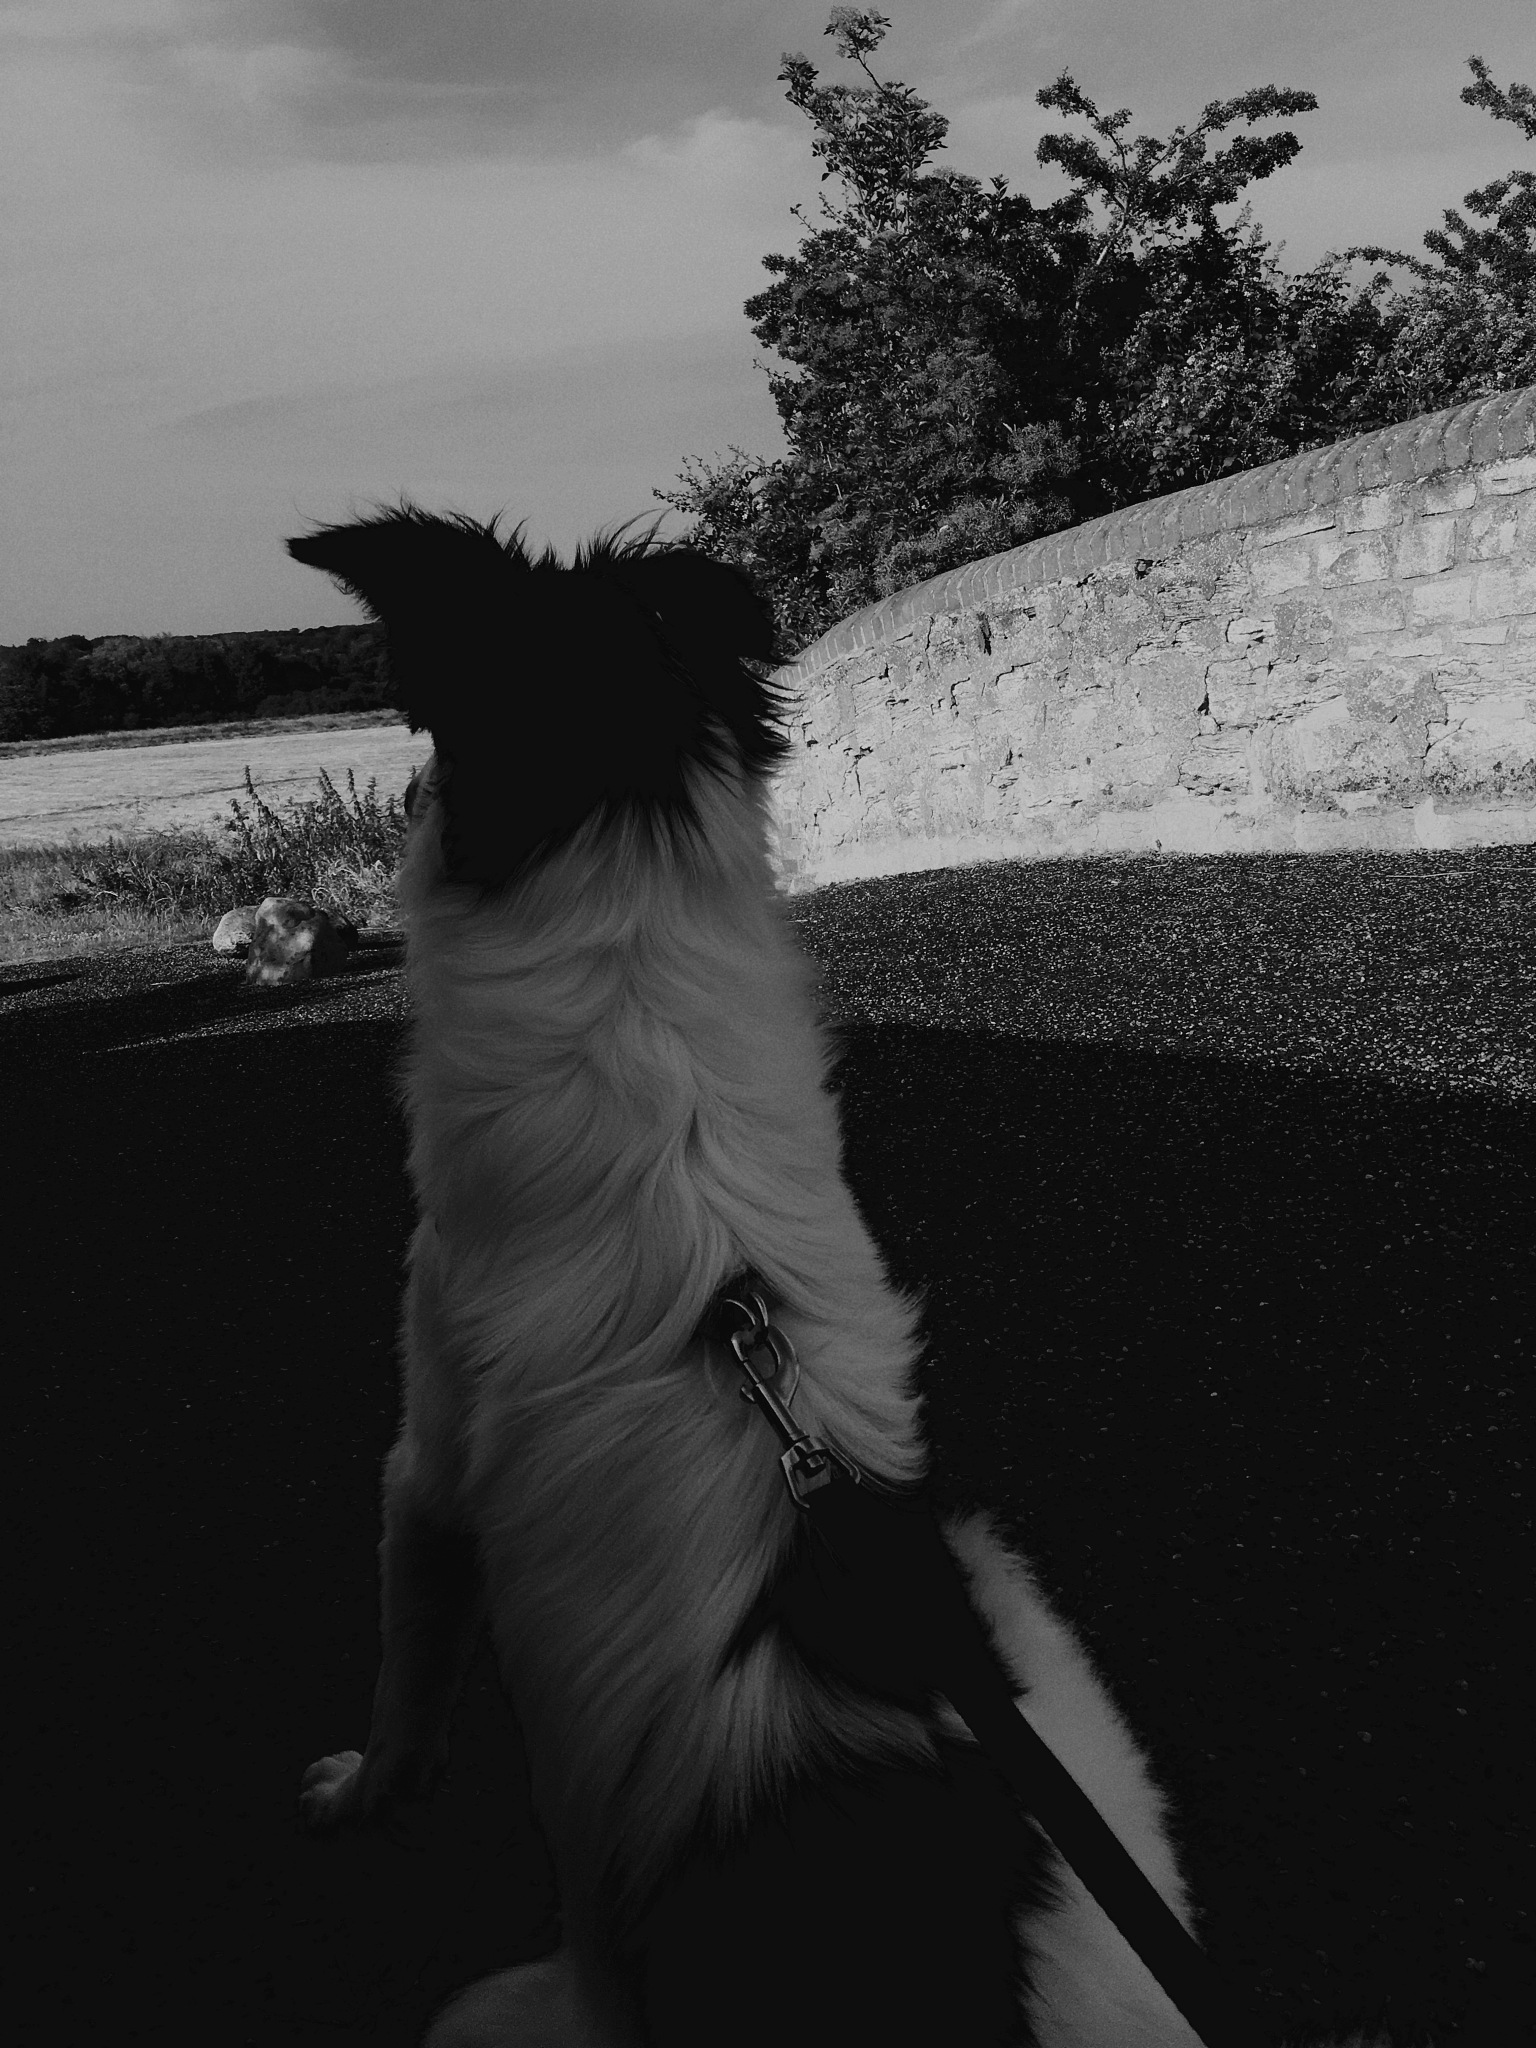 Puppy & Bridge by Tazmin Buckingham